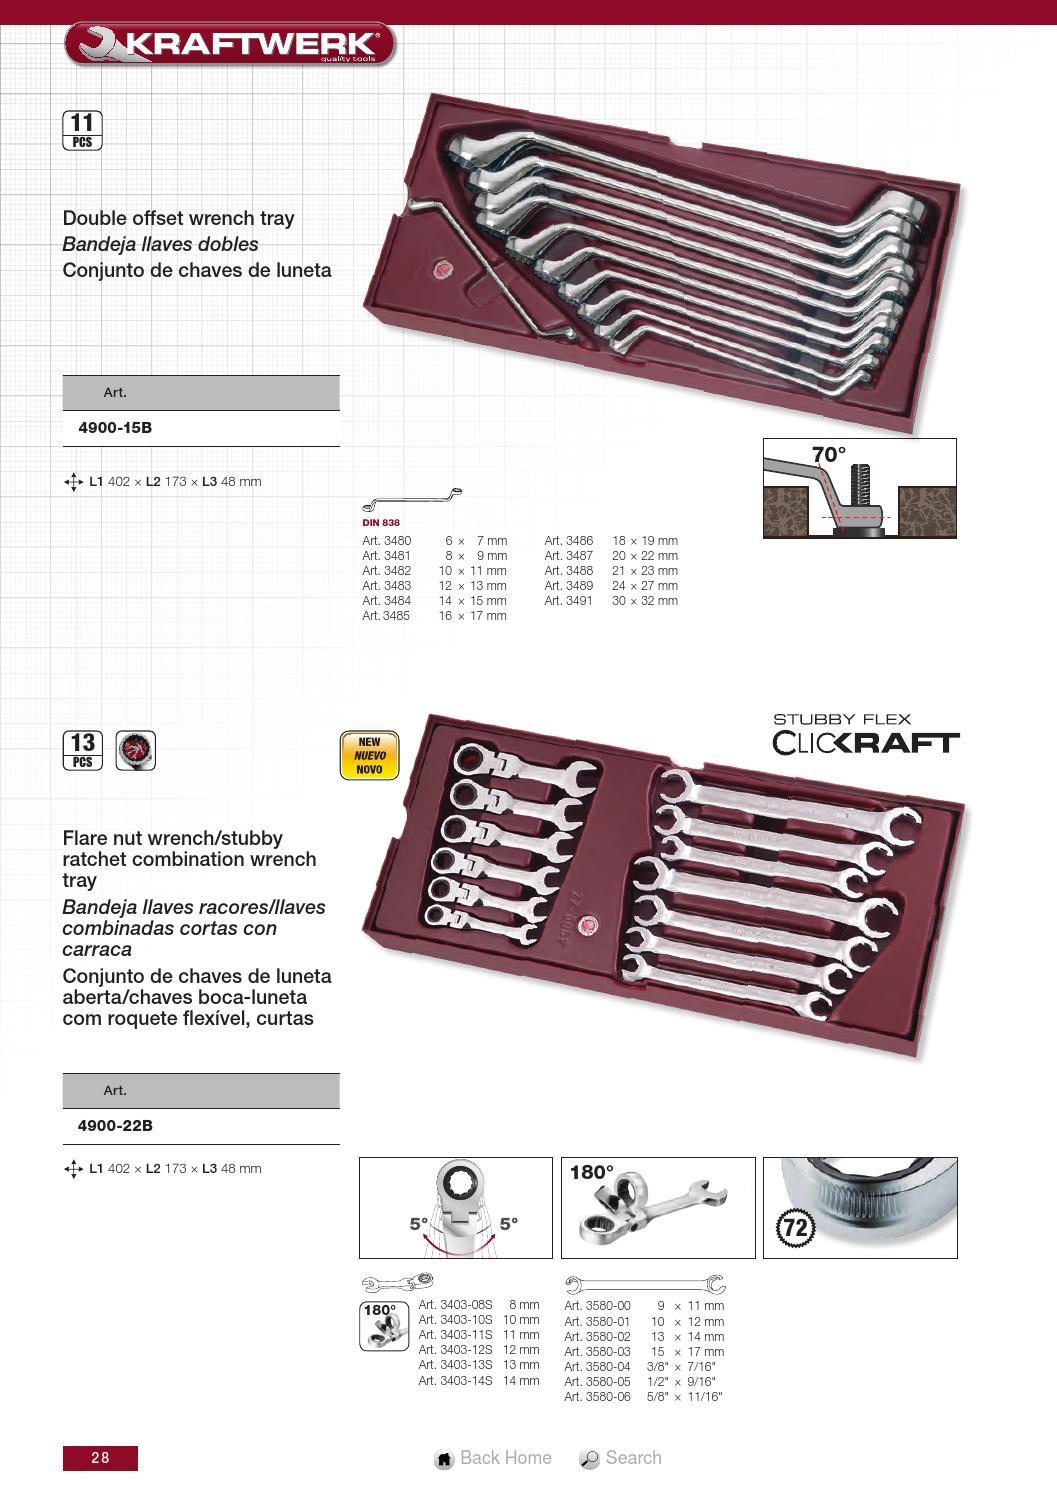 Llave racores 15 x 17 mm KRAFTWERK 3580-03